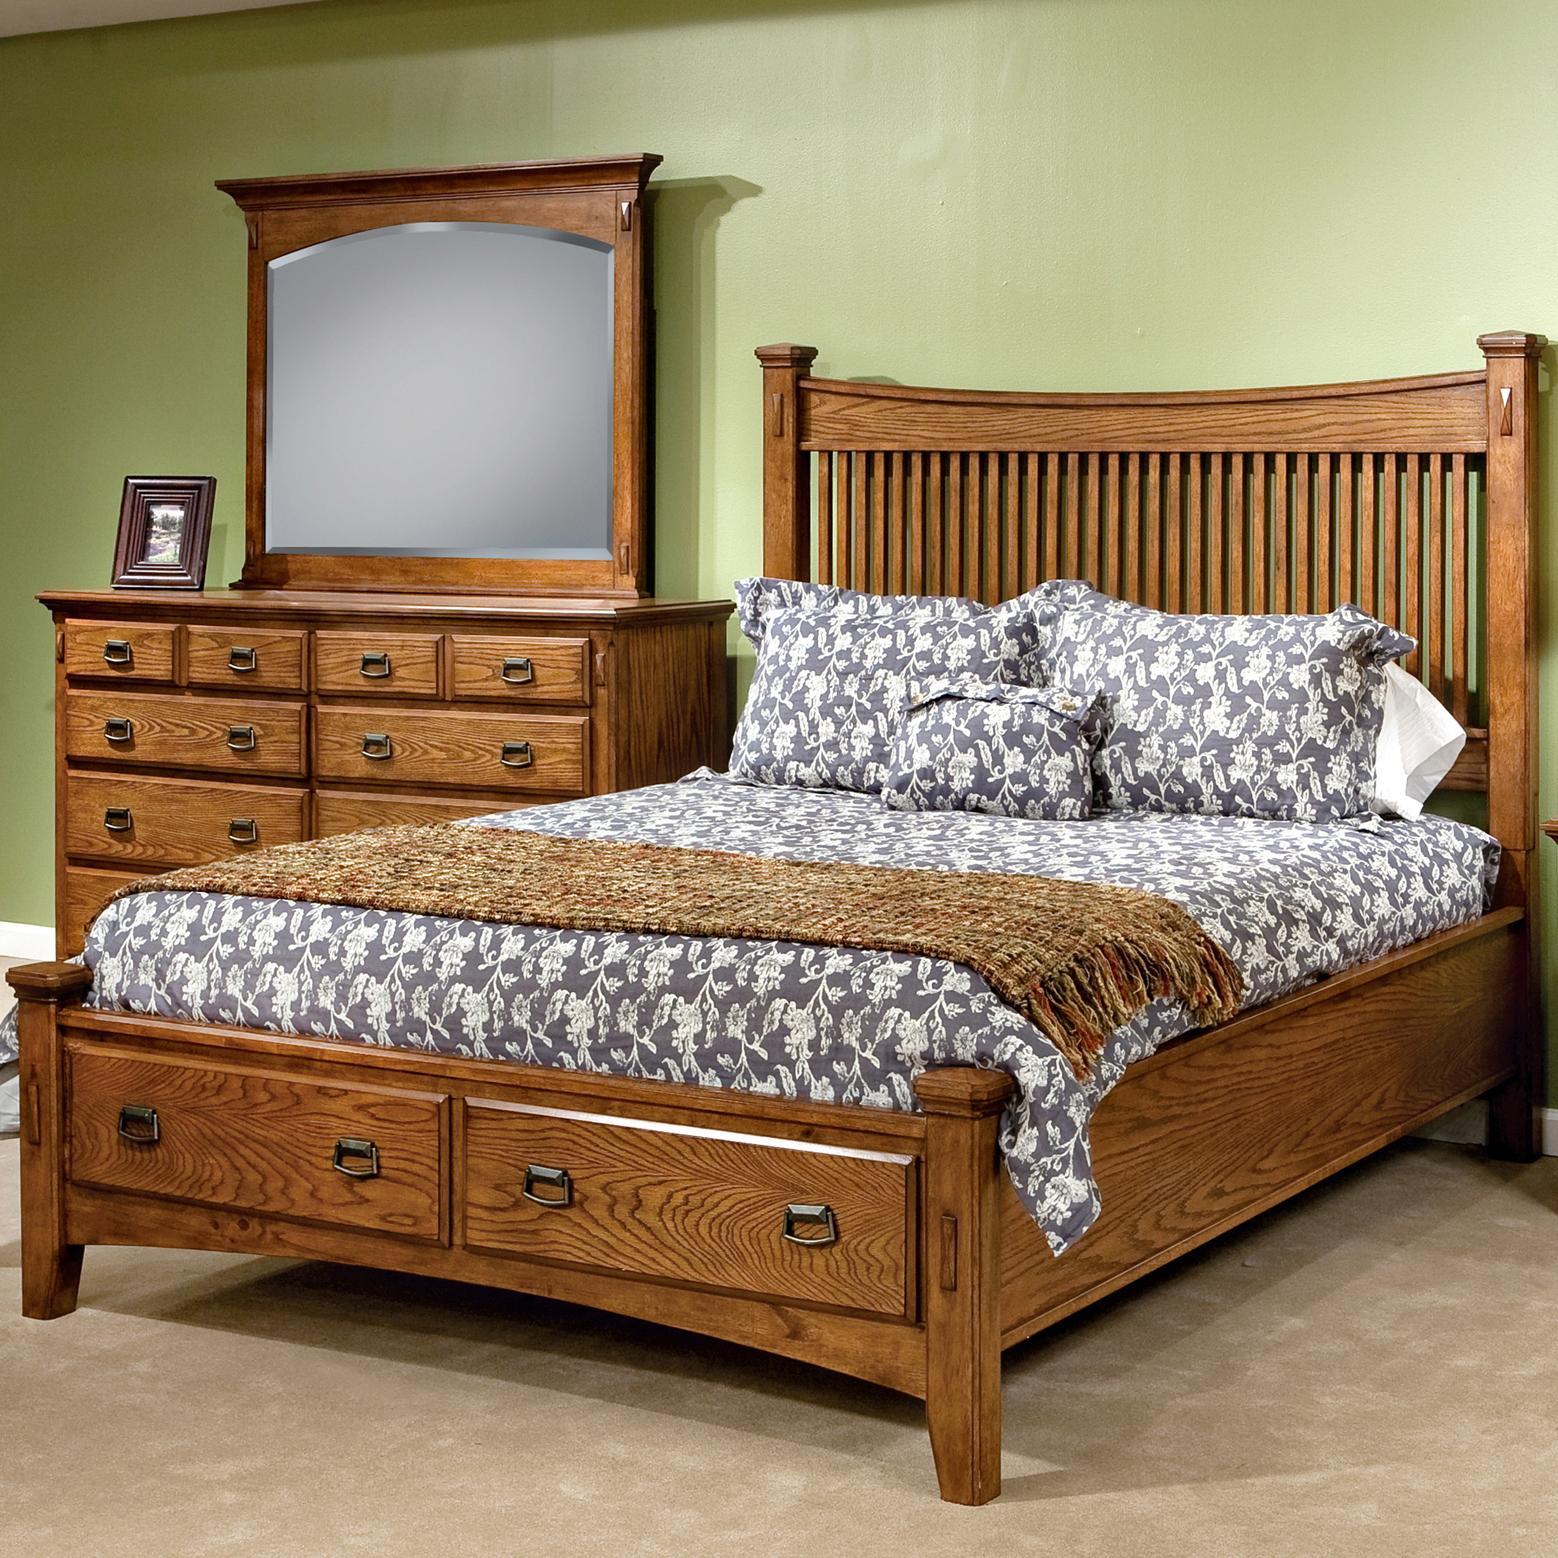 Intercon Pasadena Revival  King Storage Bed - Item Number: PR-BR-5450KS-MBN-FB+RS+5450K-MBN-HB